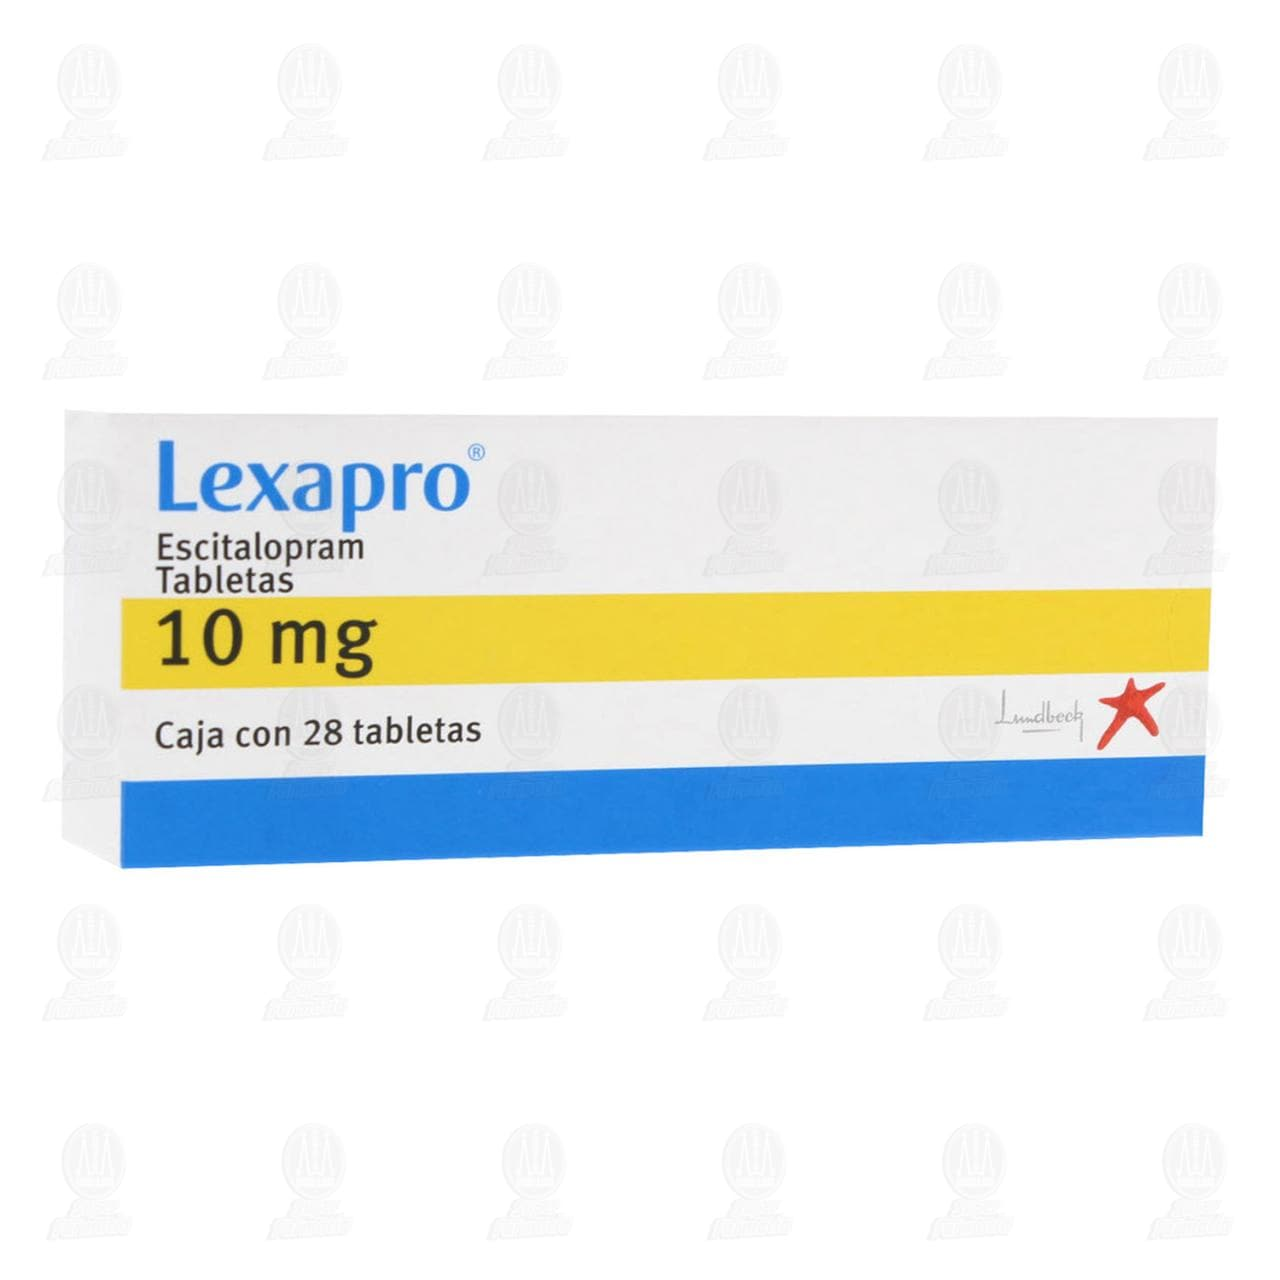 Lexapro 10mg 28 Tabletas